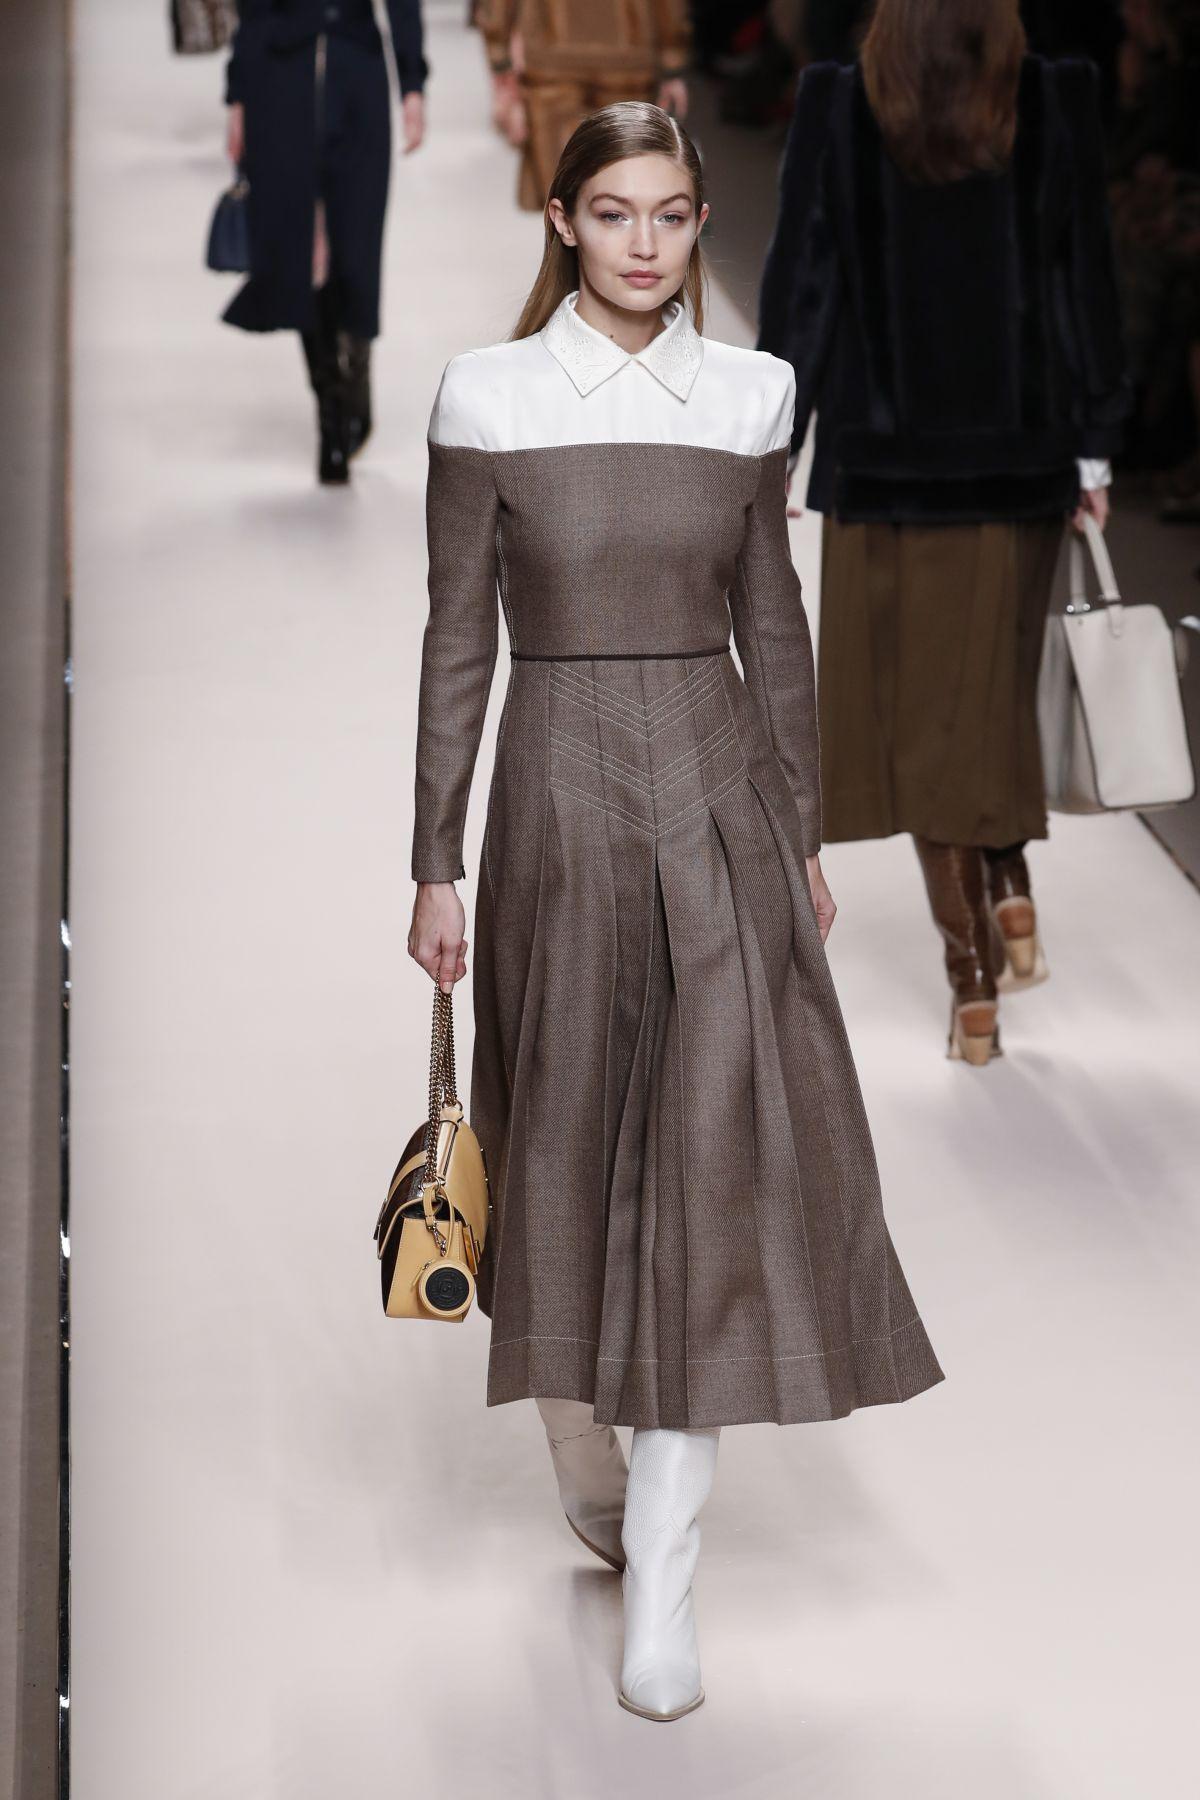 GIGI HADID at Fendi Fashion Show at MFW in Milan 02/22 ...